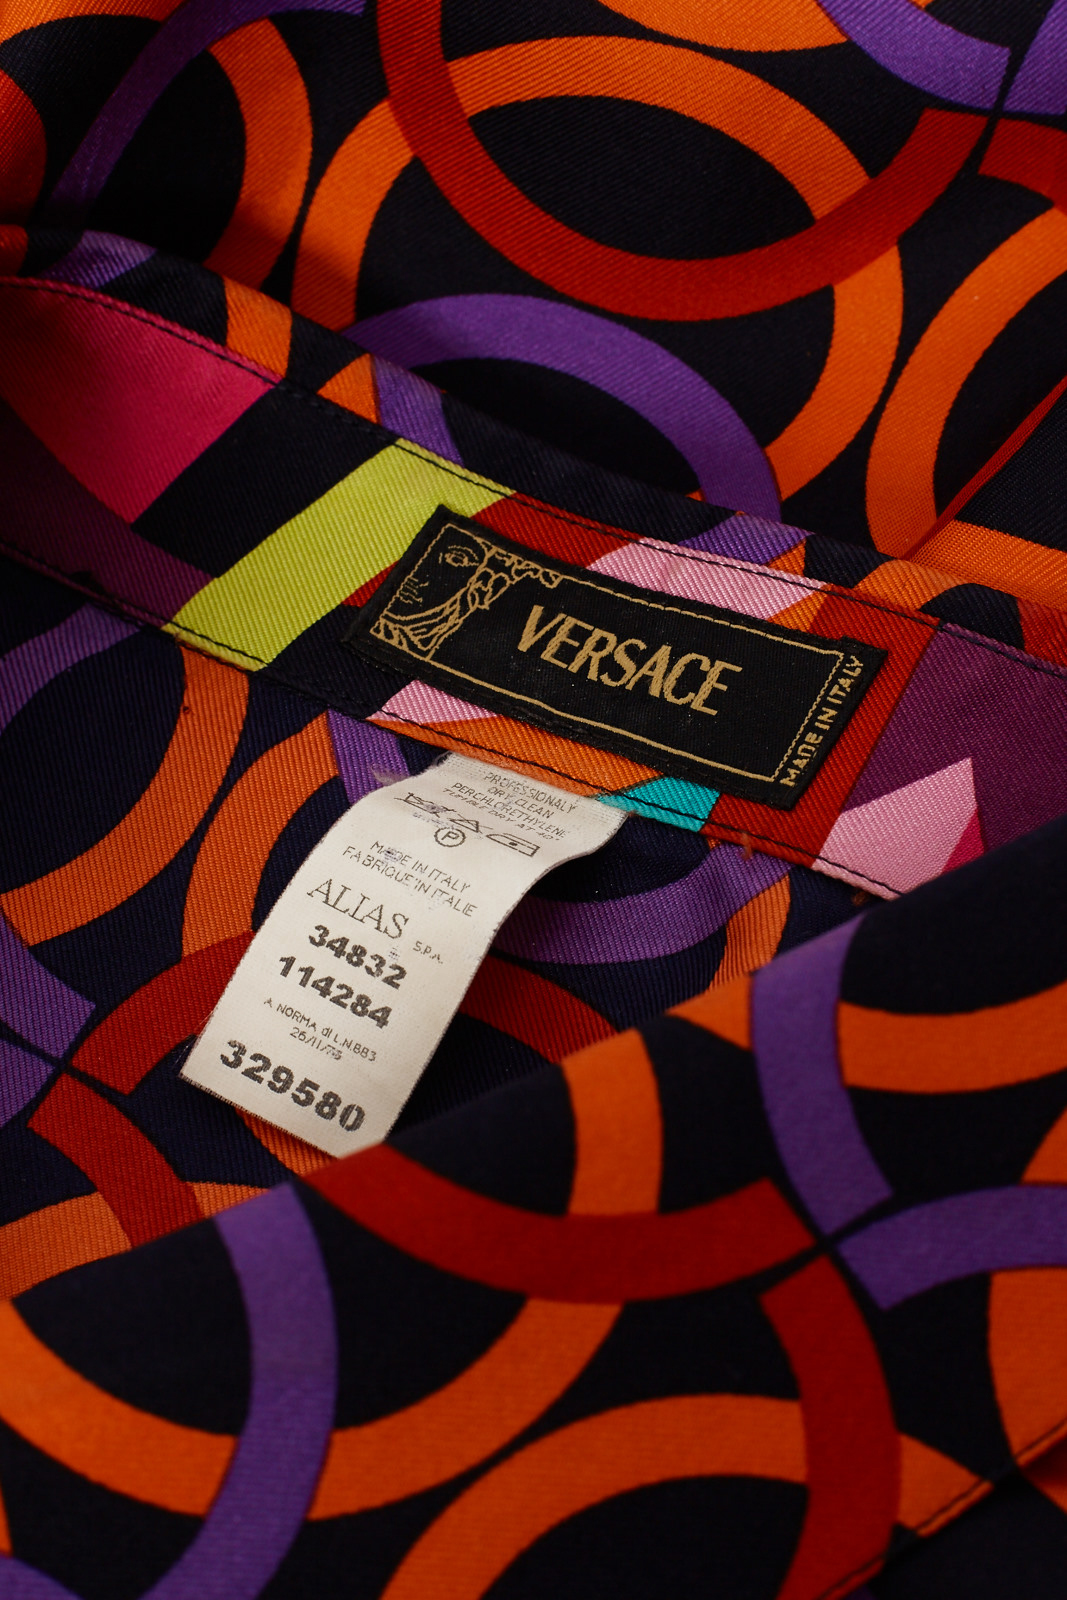 vintage_store_versace160118_Vin0624